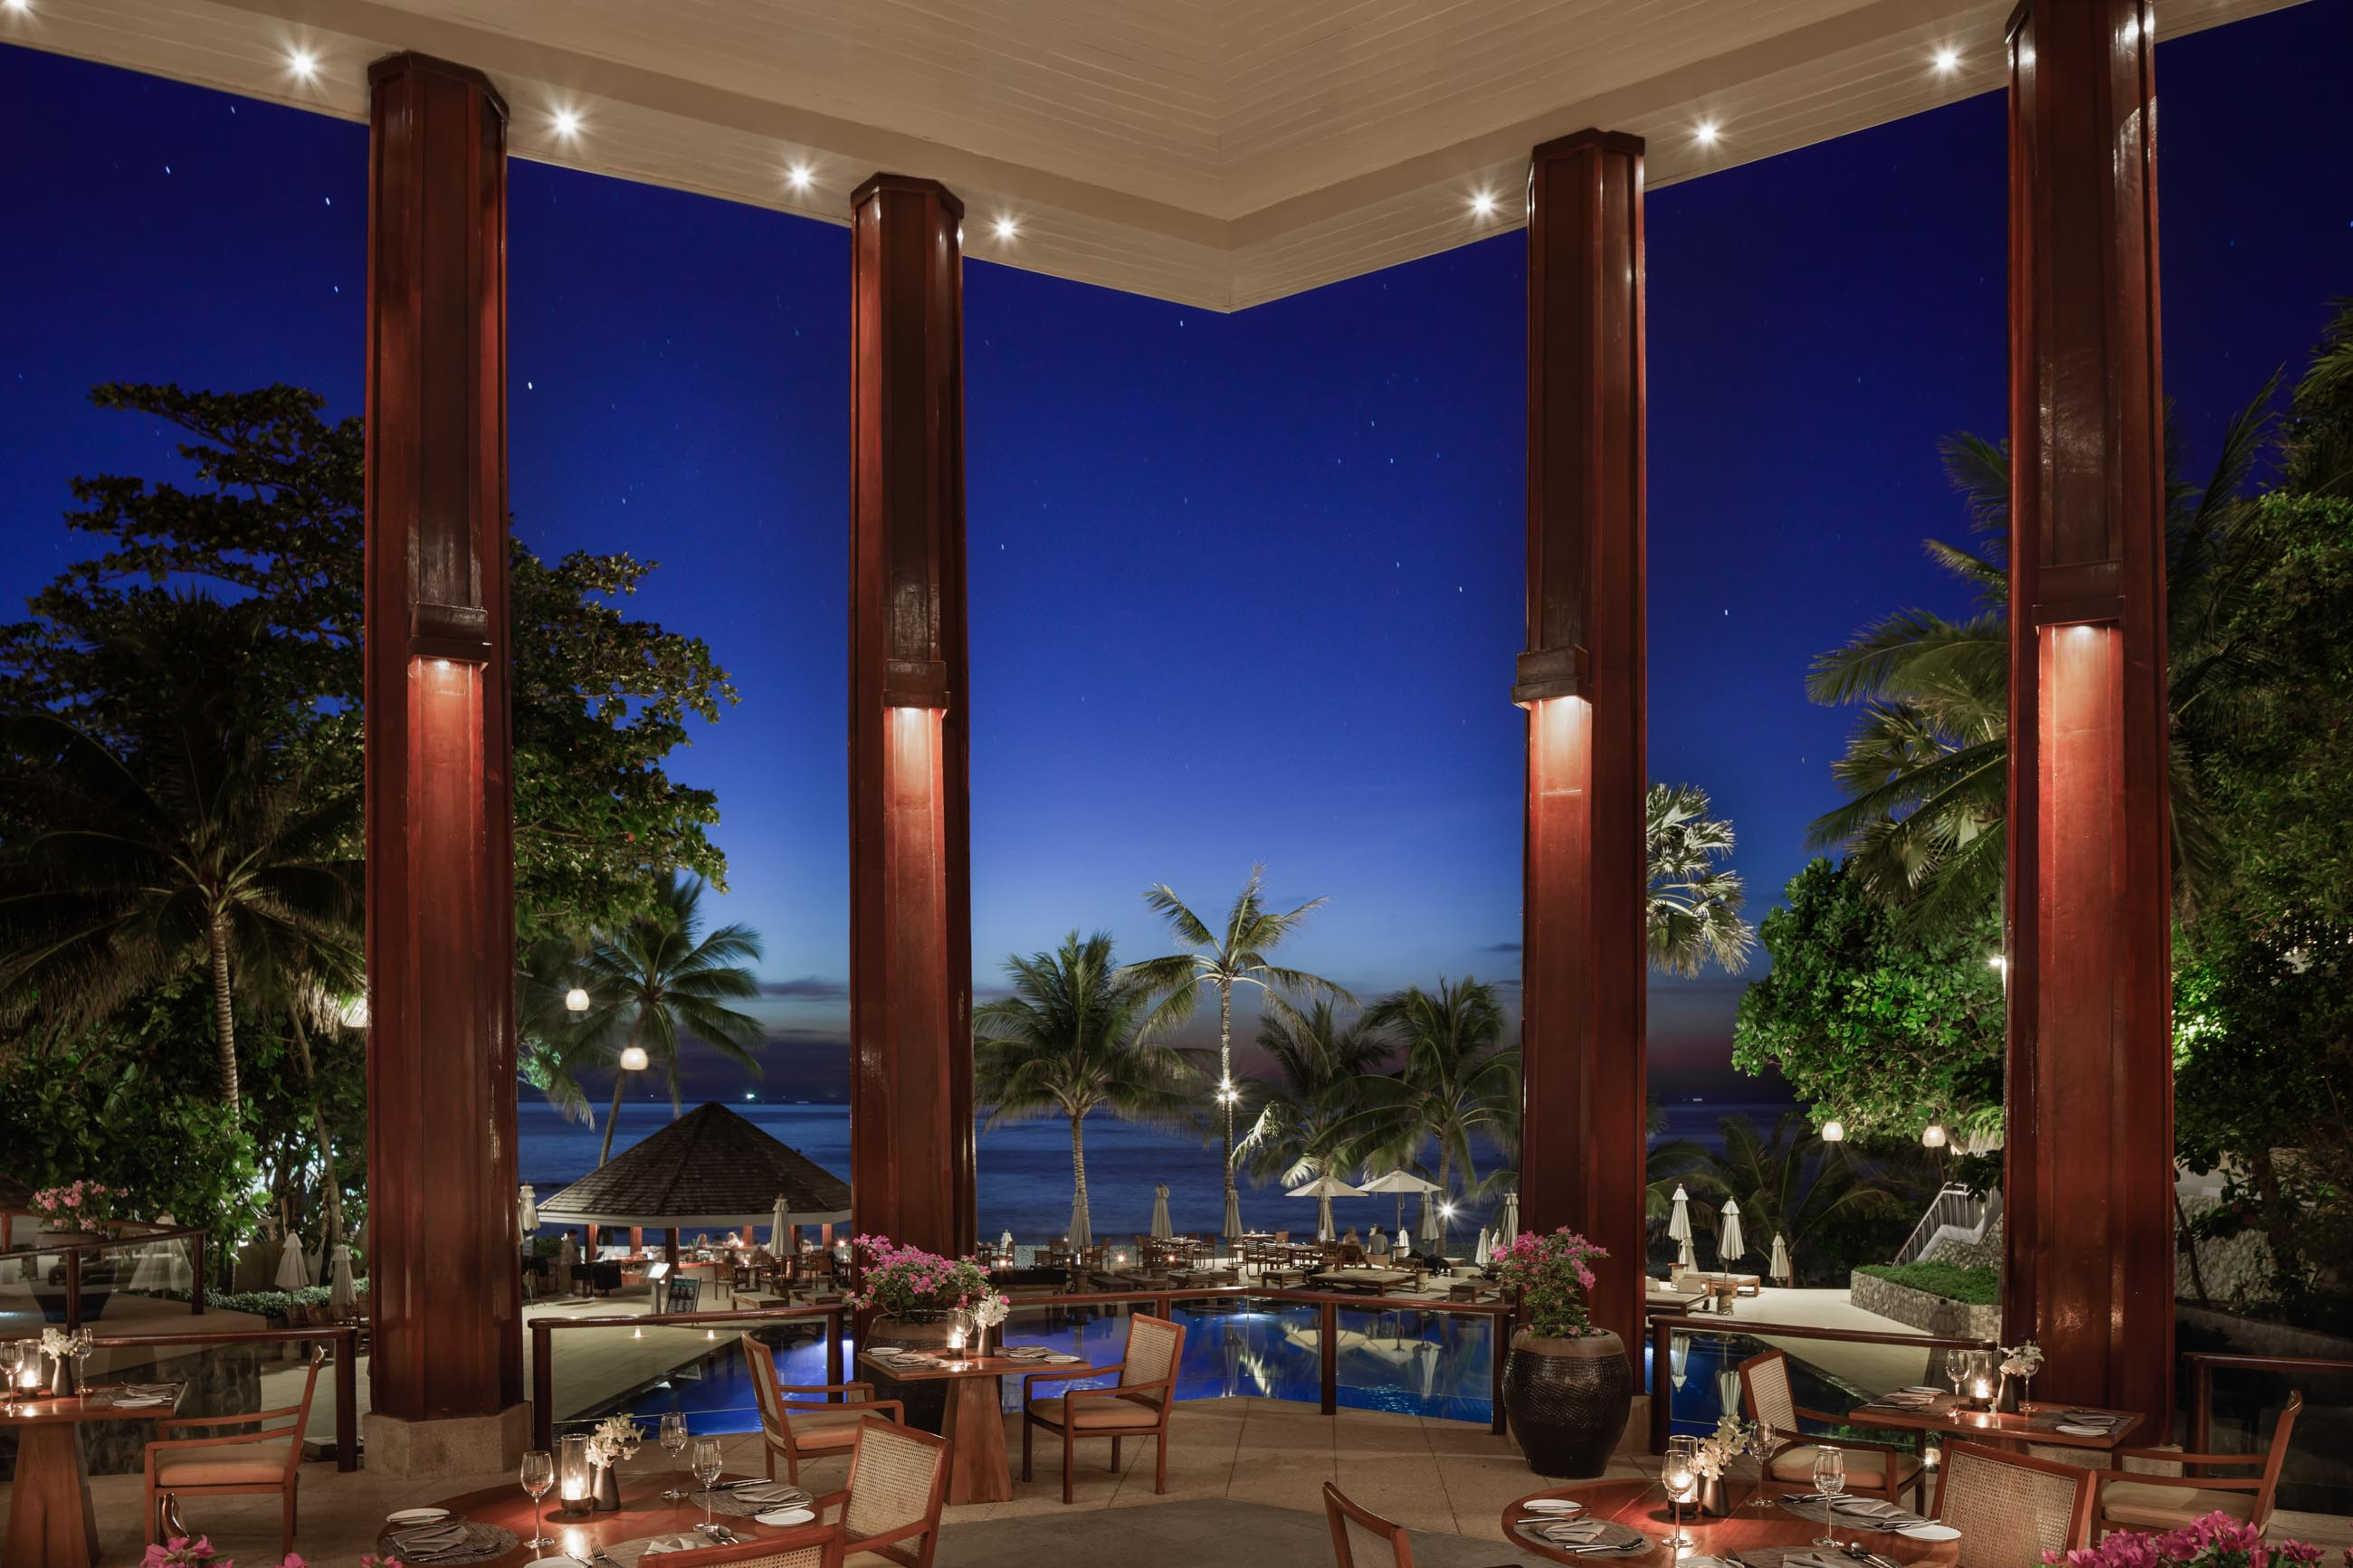 https://bubo.sk/uploads/galleries/7404/thesurin_3_sunset-restaurant_47930.jpg